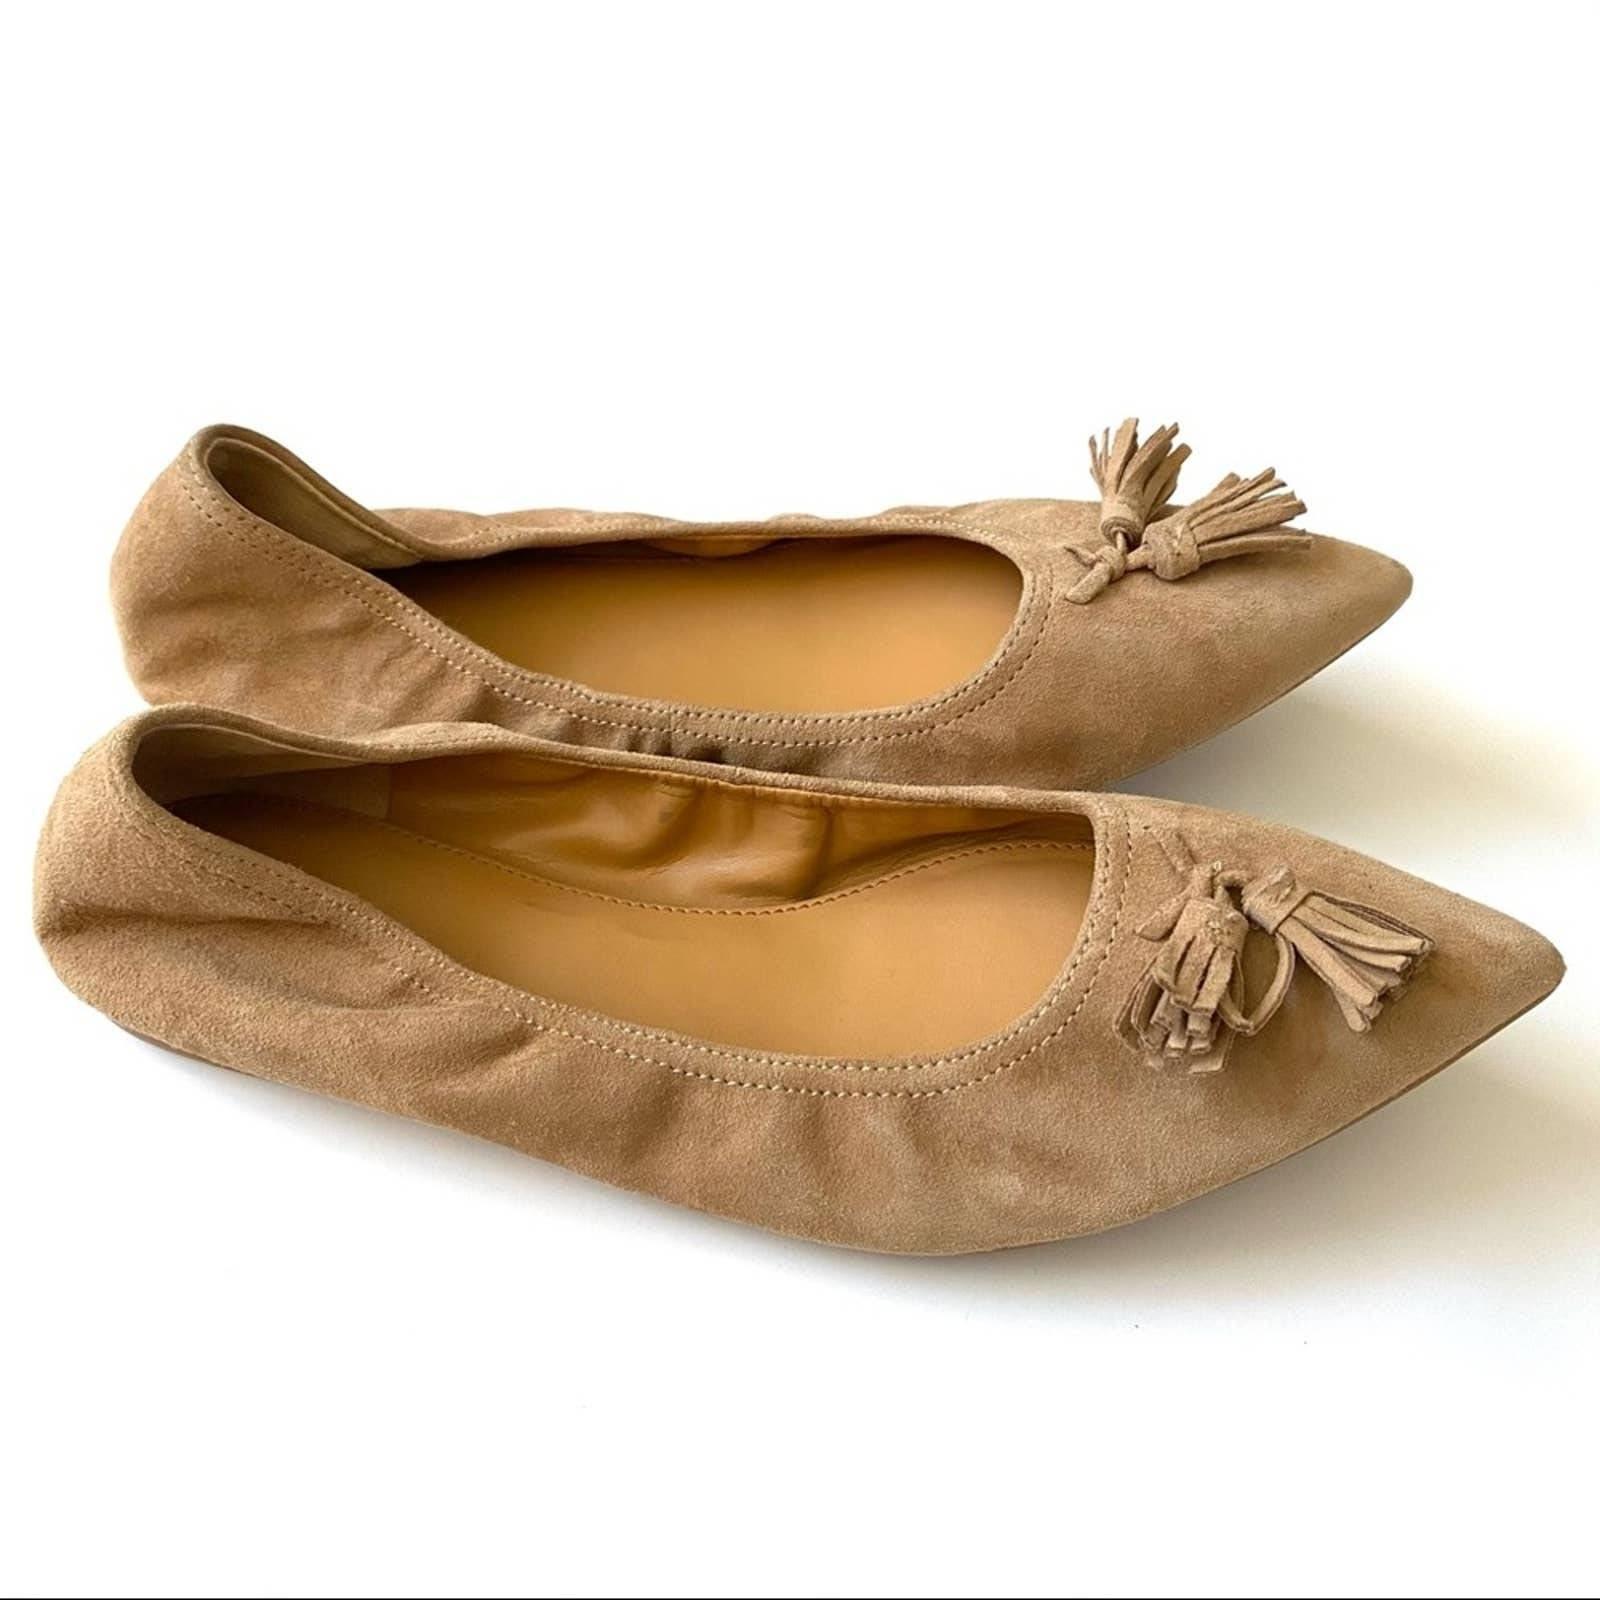 J Crew Lottie Tassle Suede Ballet Flats